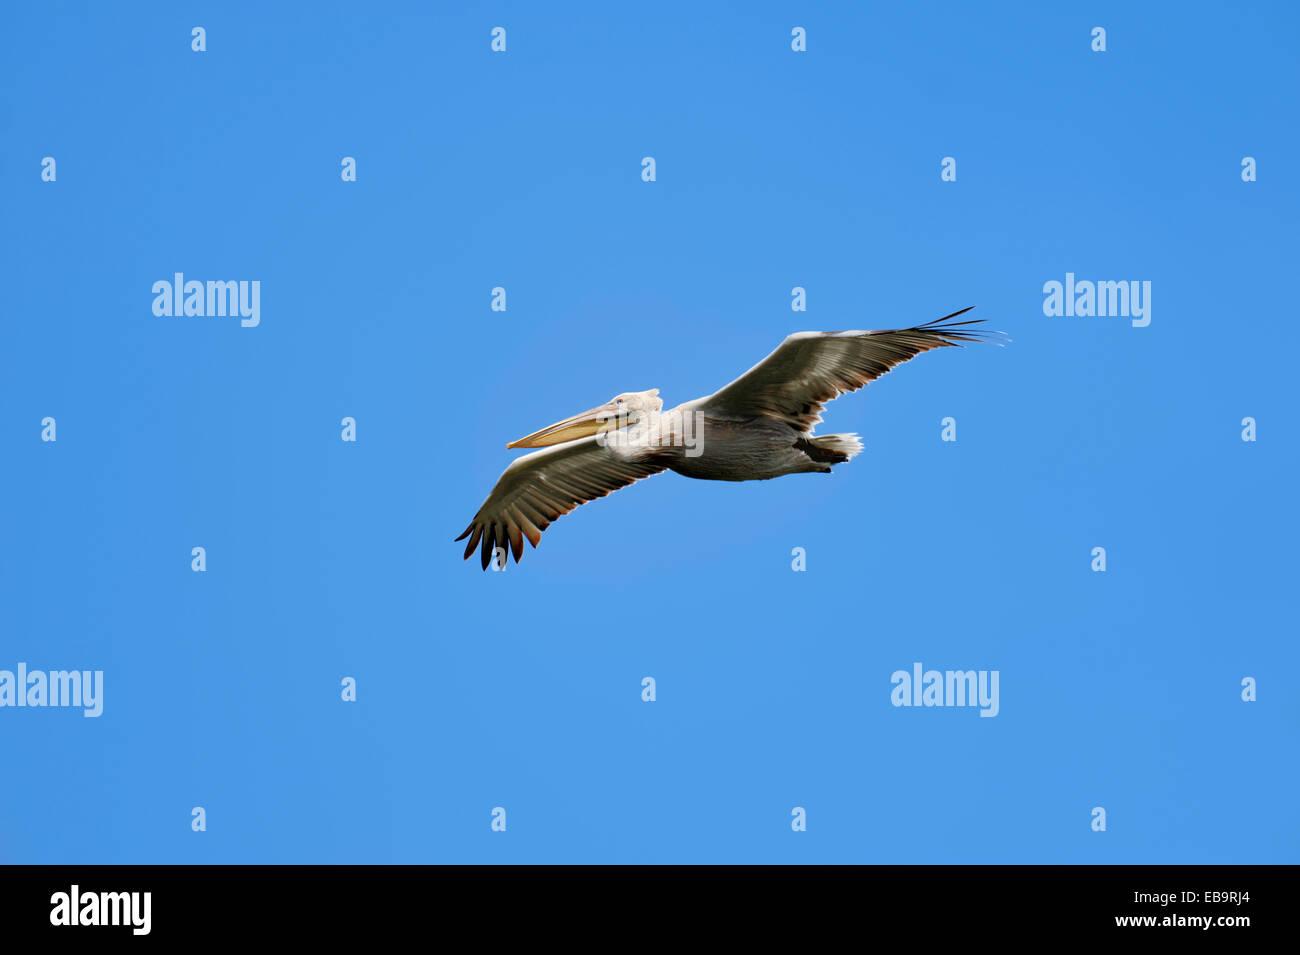 Dalmatian Pelican (Pelecanus crispus) in flight, Central Macedonia, Greece - Stock Image